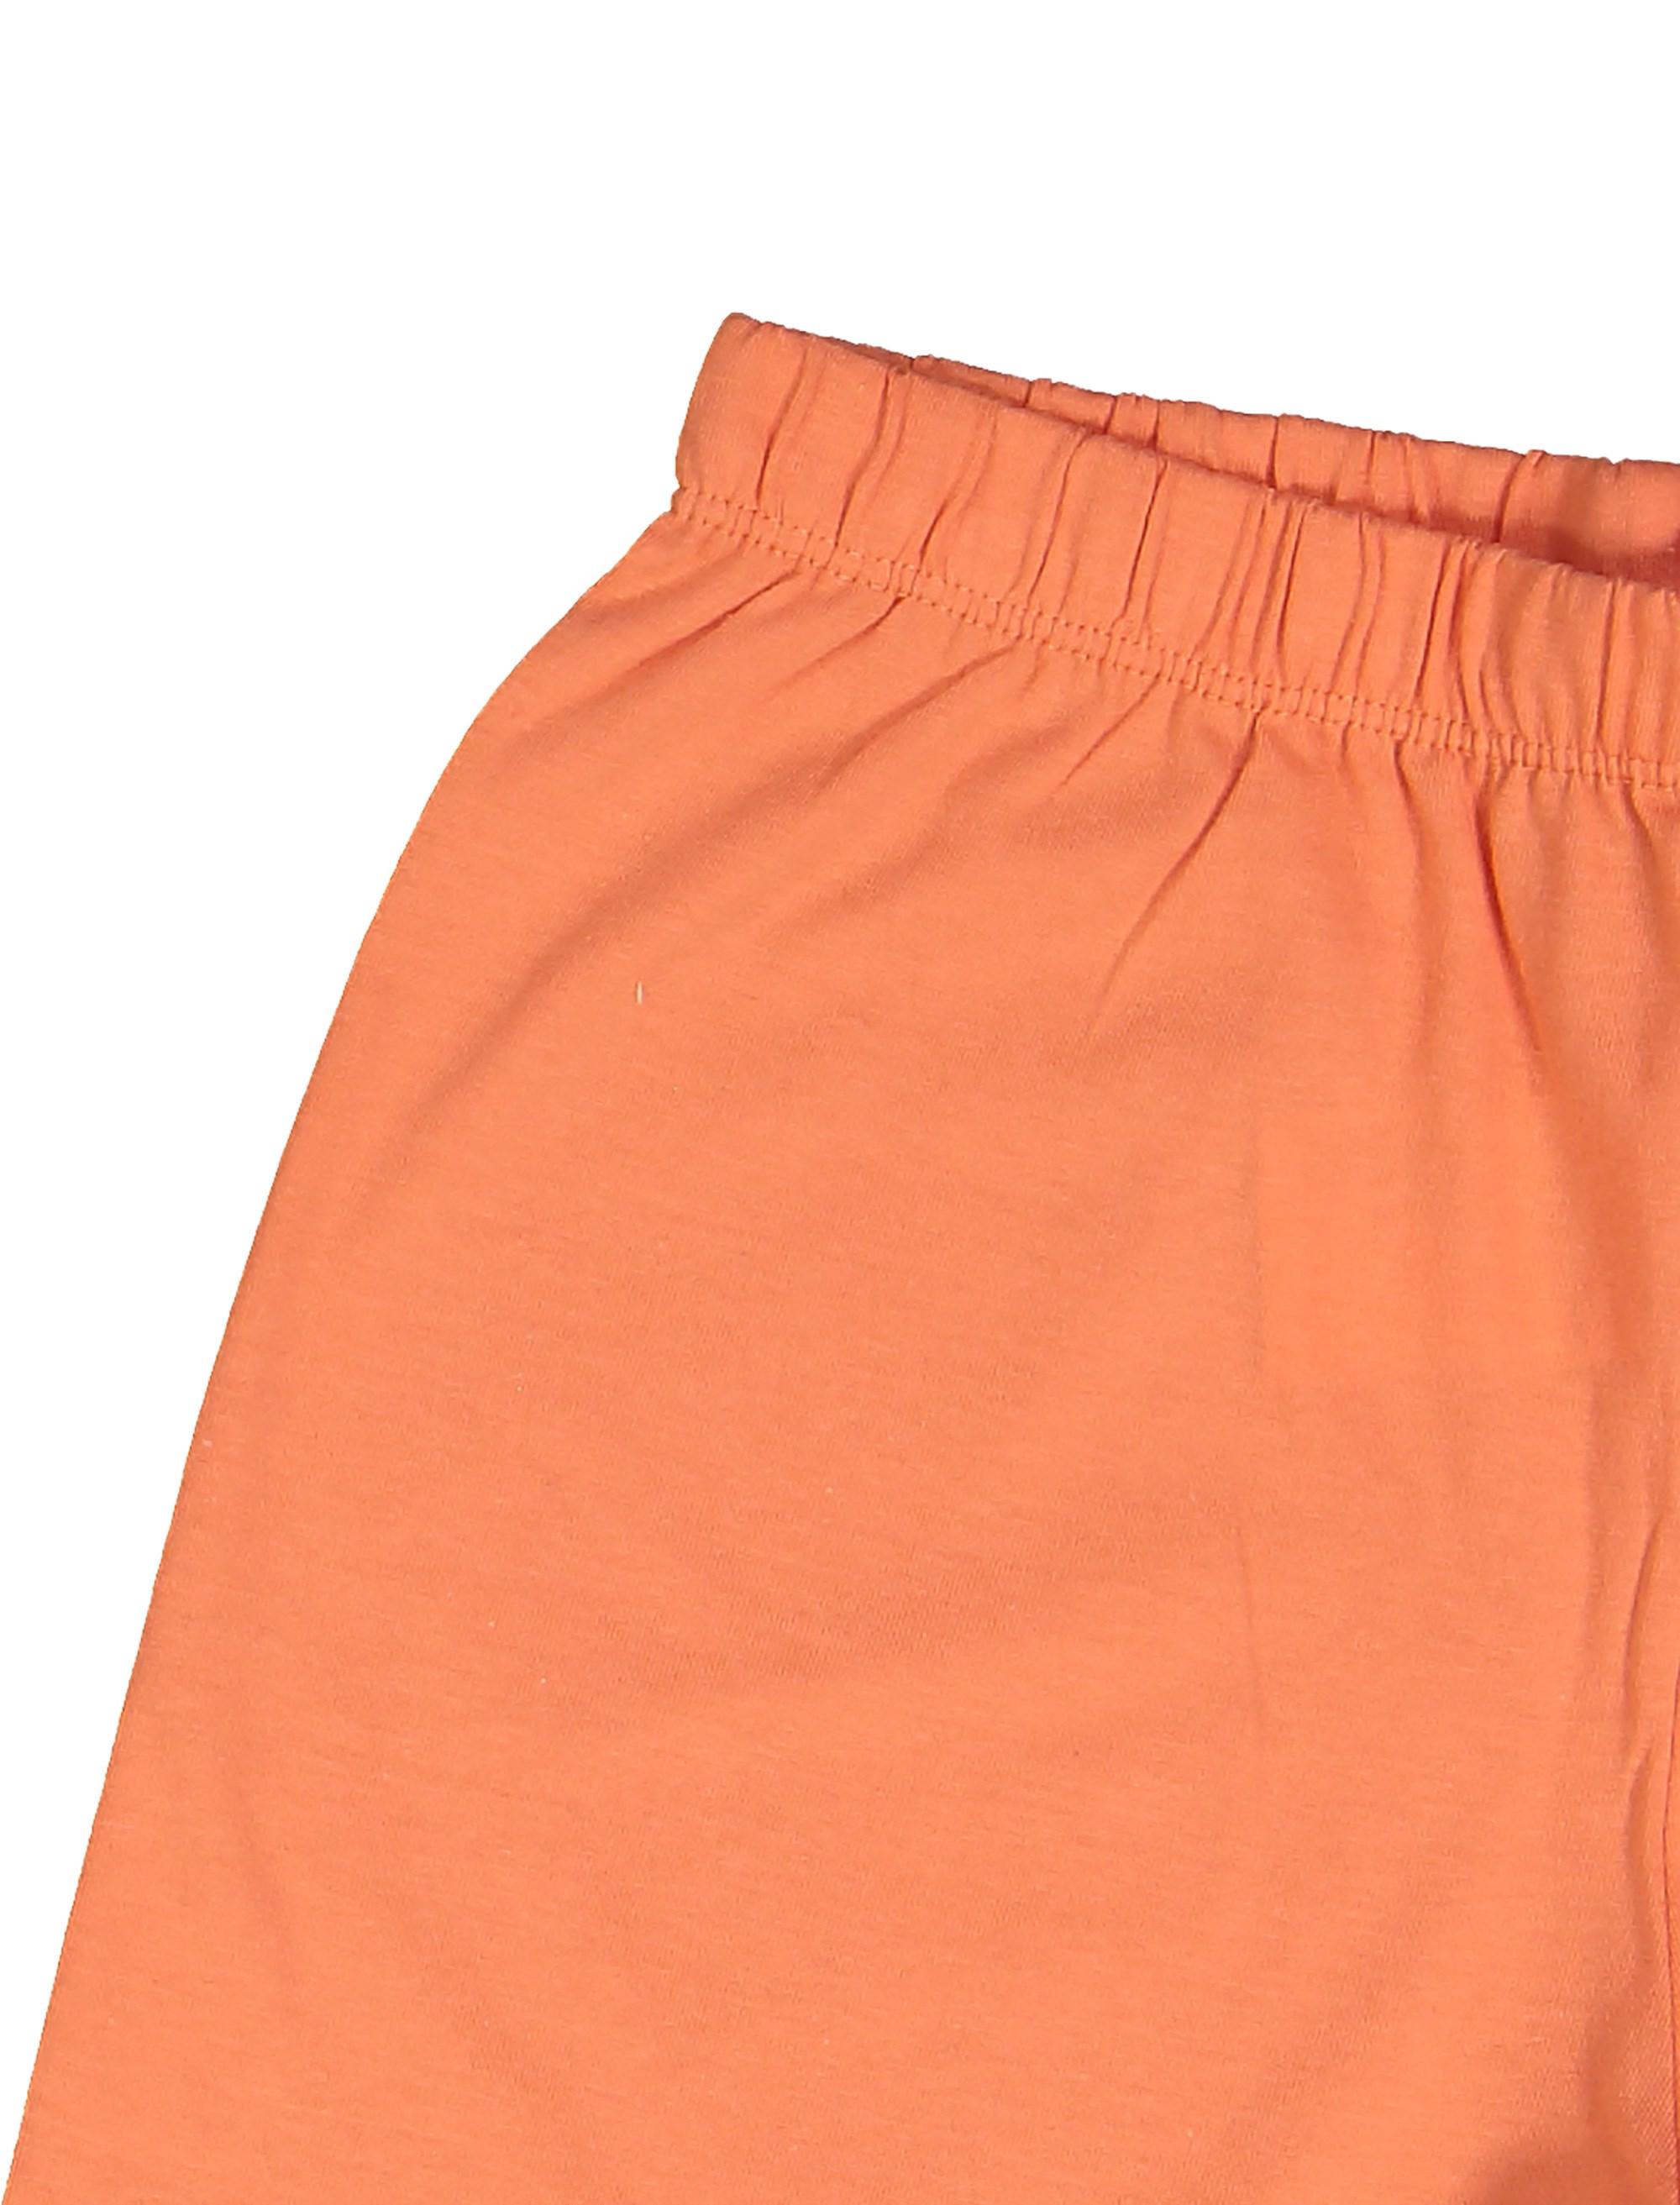 تی شرت و شلوارک نخی پسرانه - سفيد/نارنجي - 4